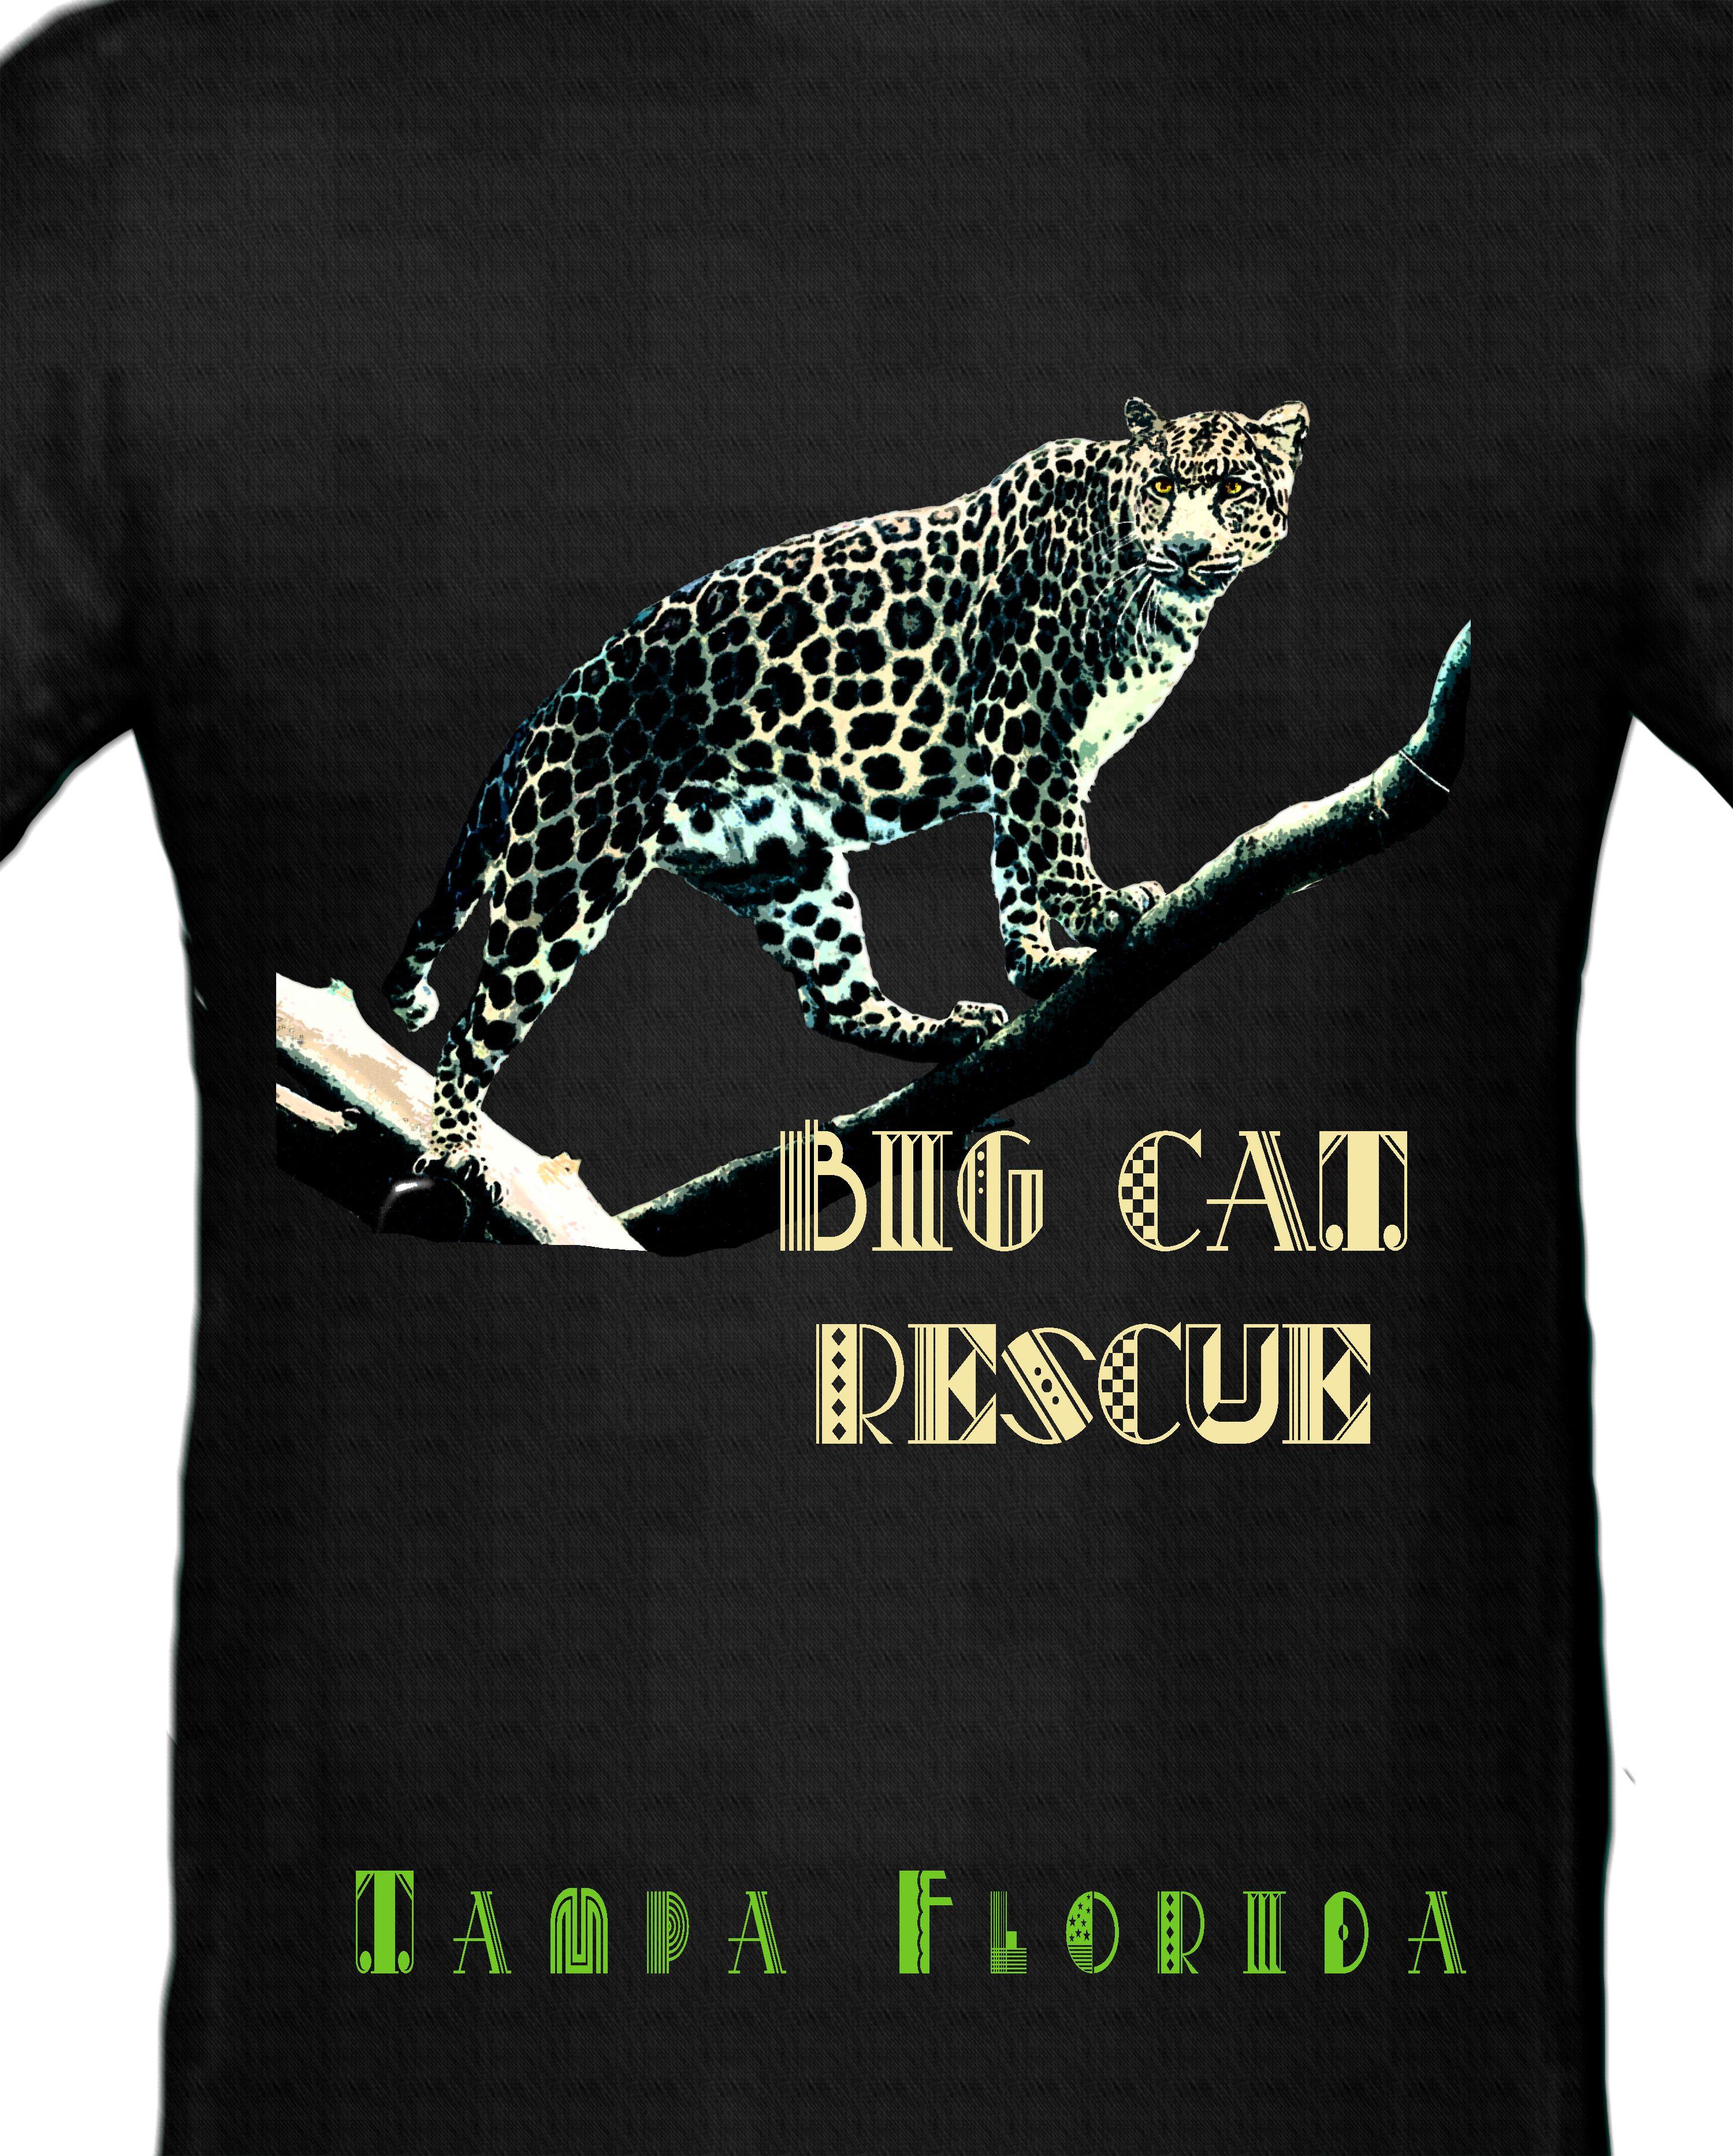 talented shirt women creative s shirts t pin by jaguar fashionable